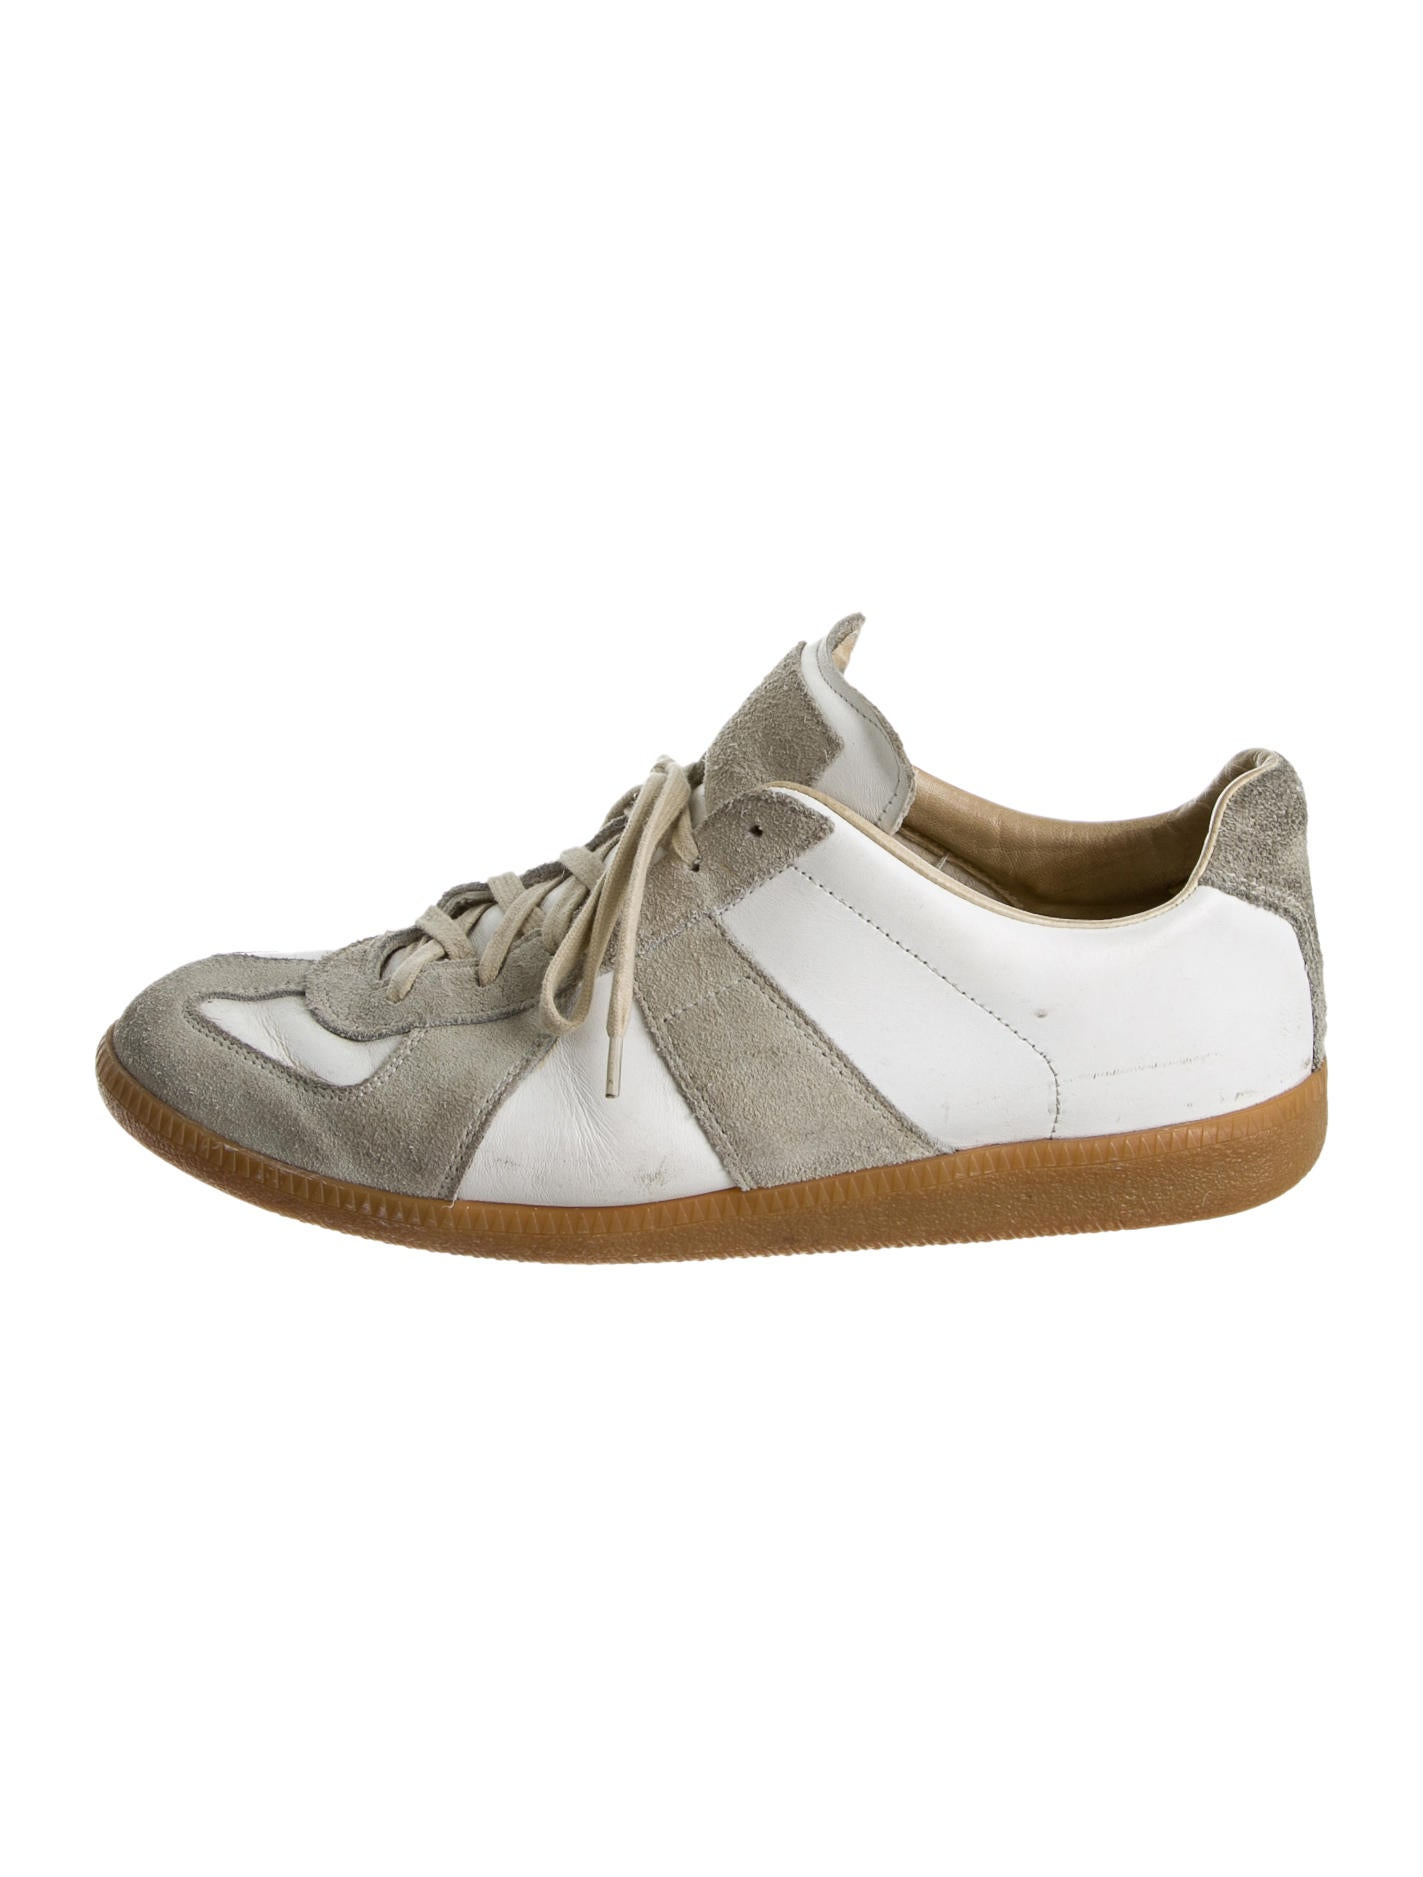 maison martin margiela sneakers shoes mai23388 the realreal. Black Bedroom Furniture Sets. Home Design Ideas